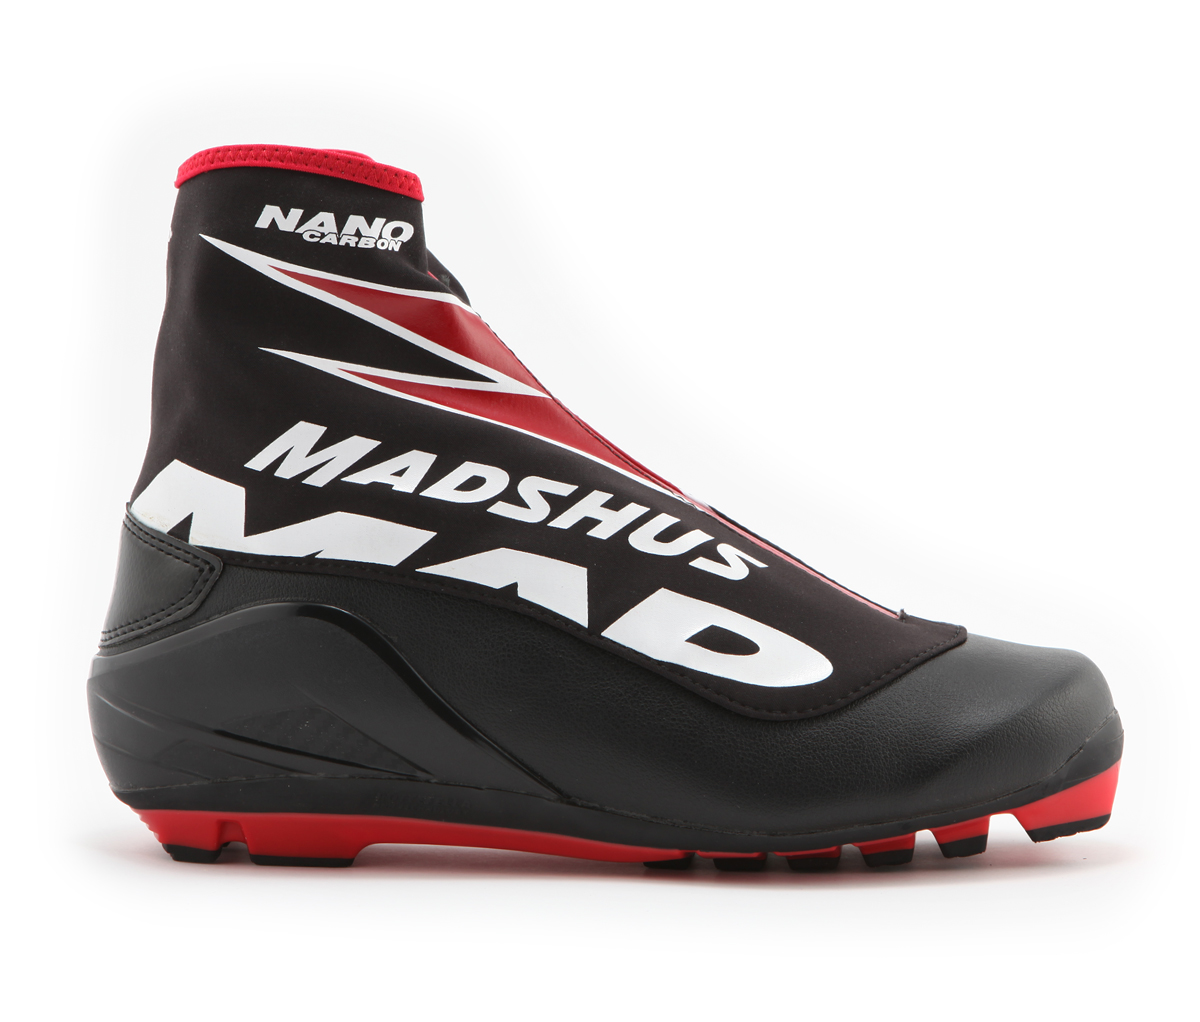 madshus_nano_carbon_classic1.jpg